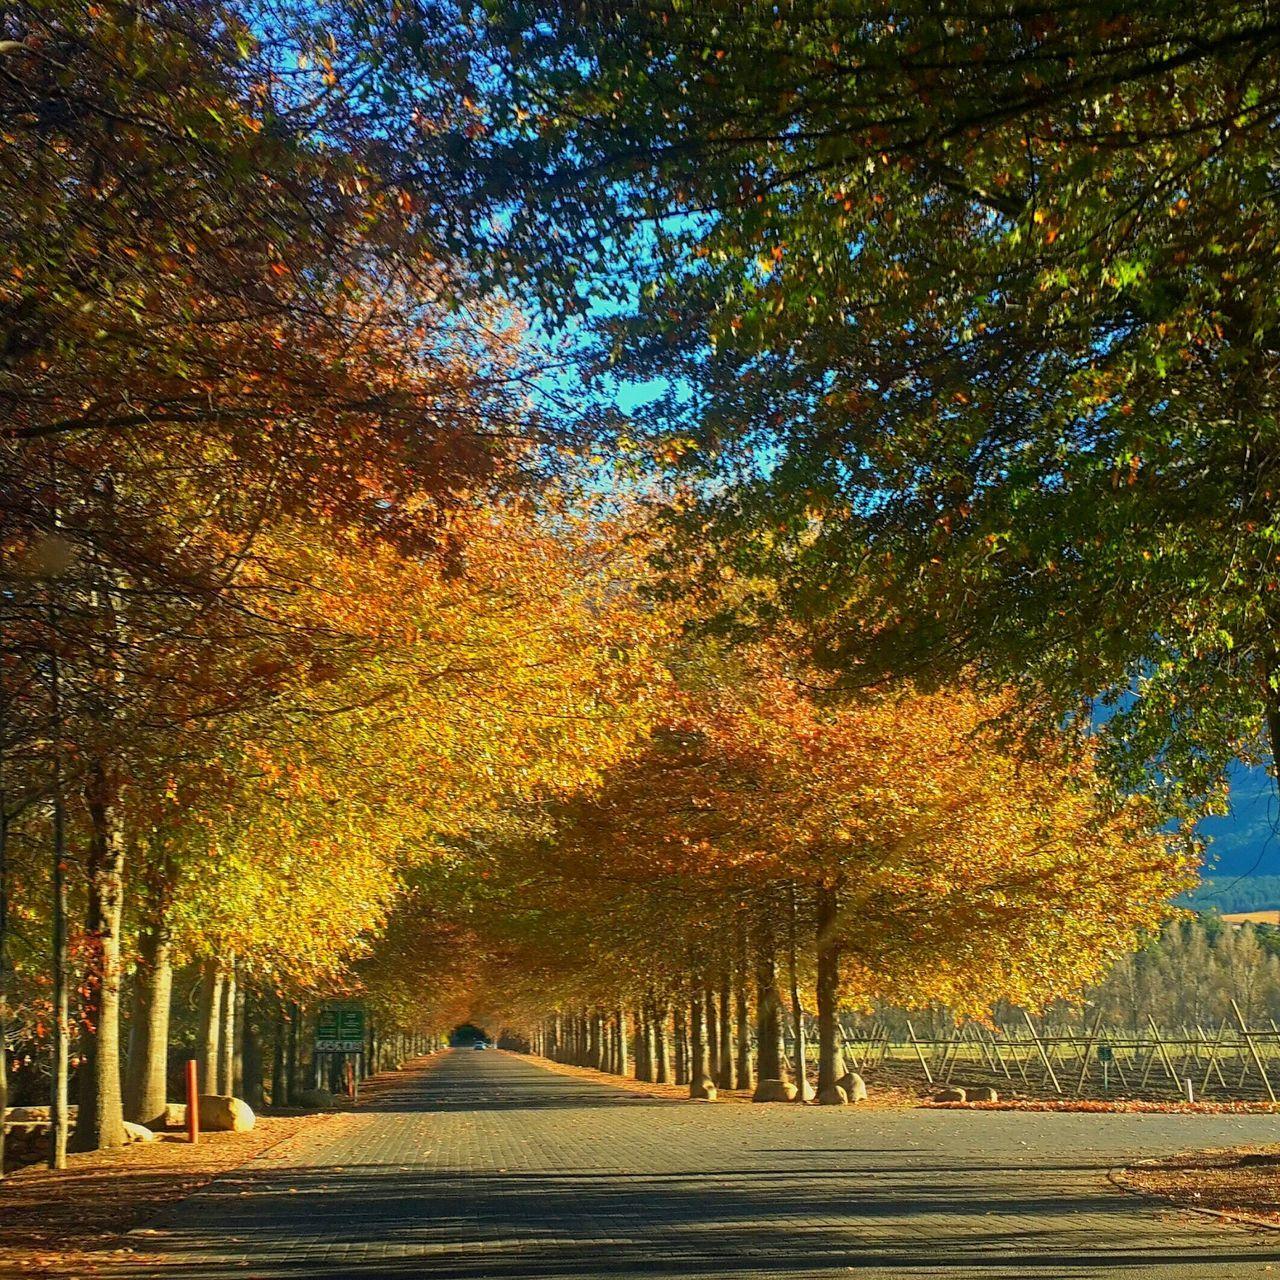 Treelined Alley In Autumn